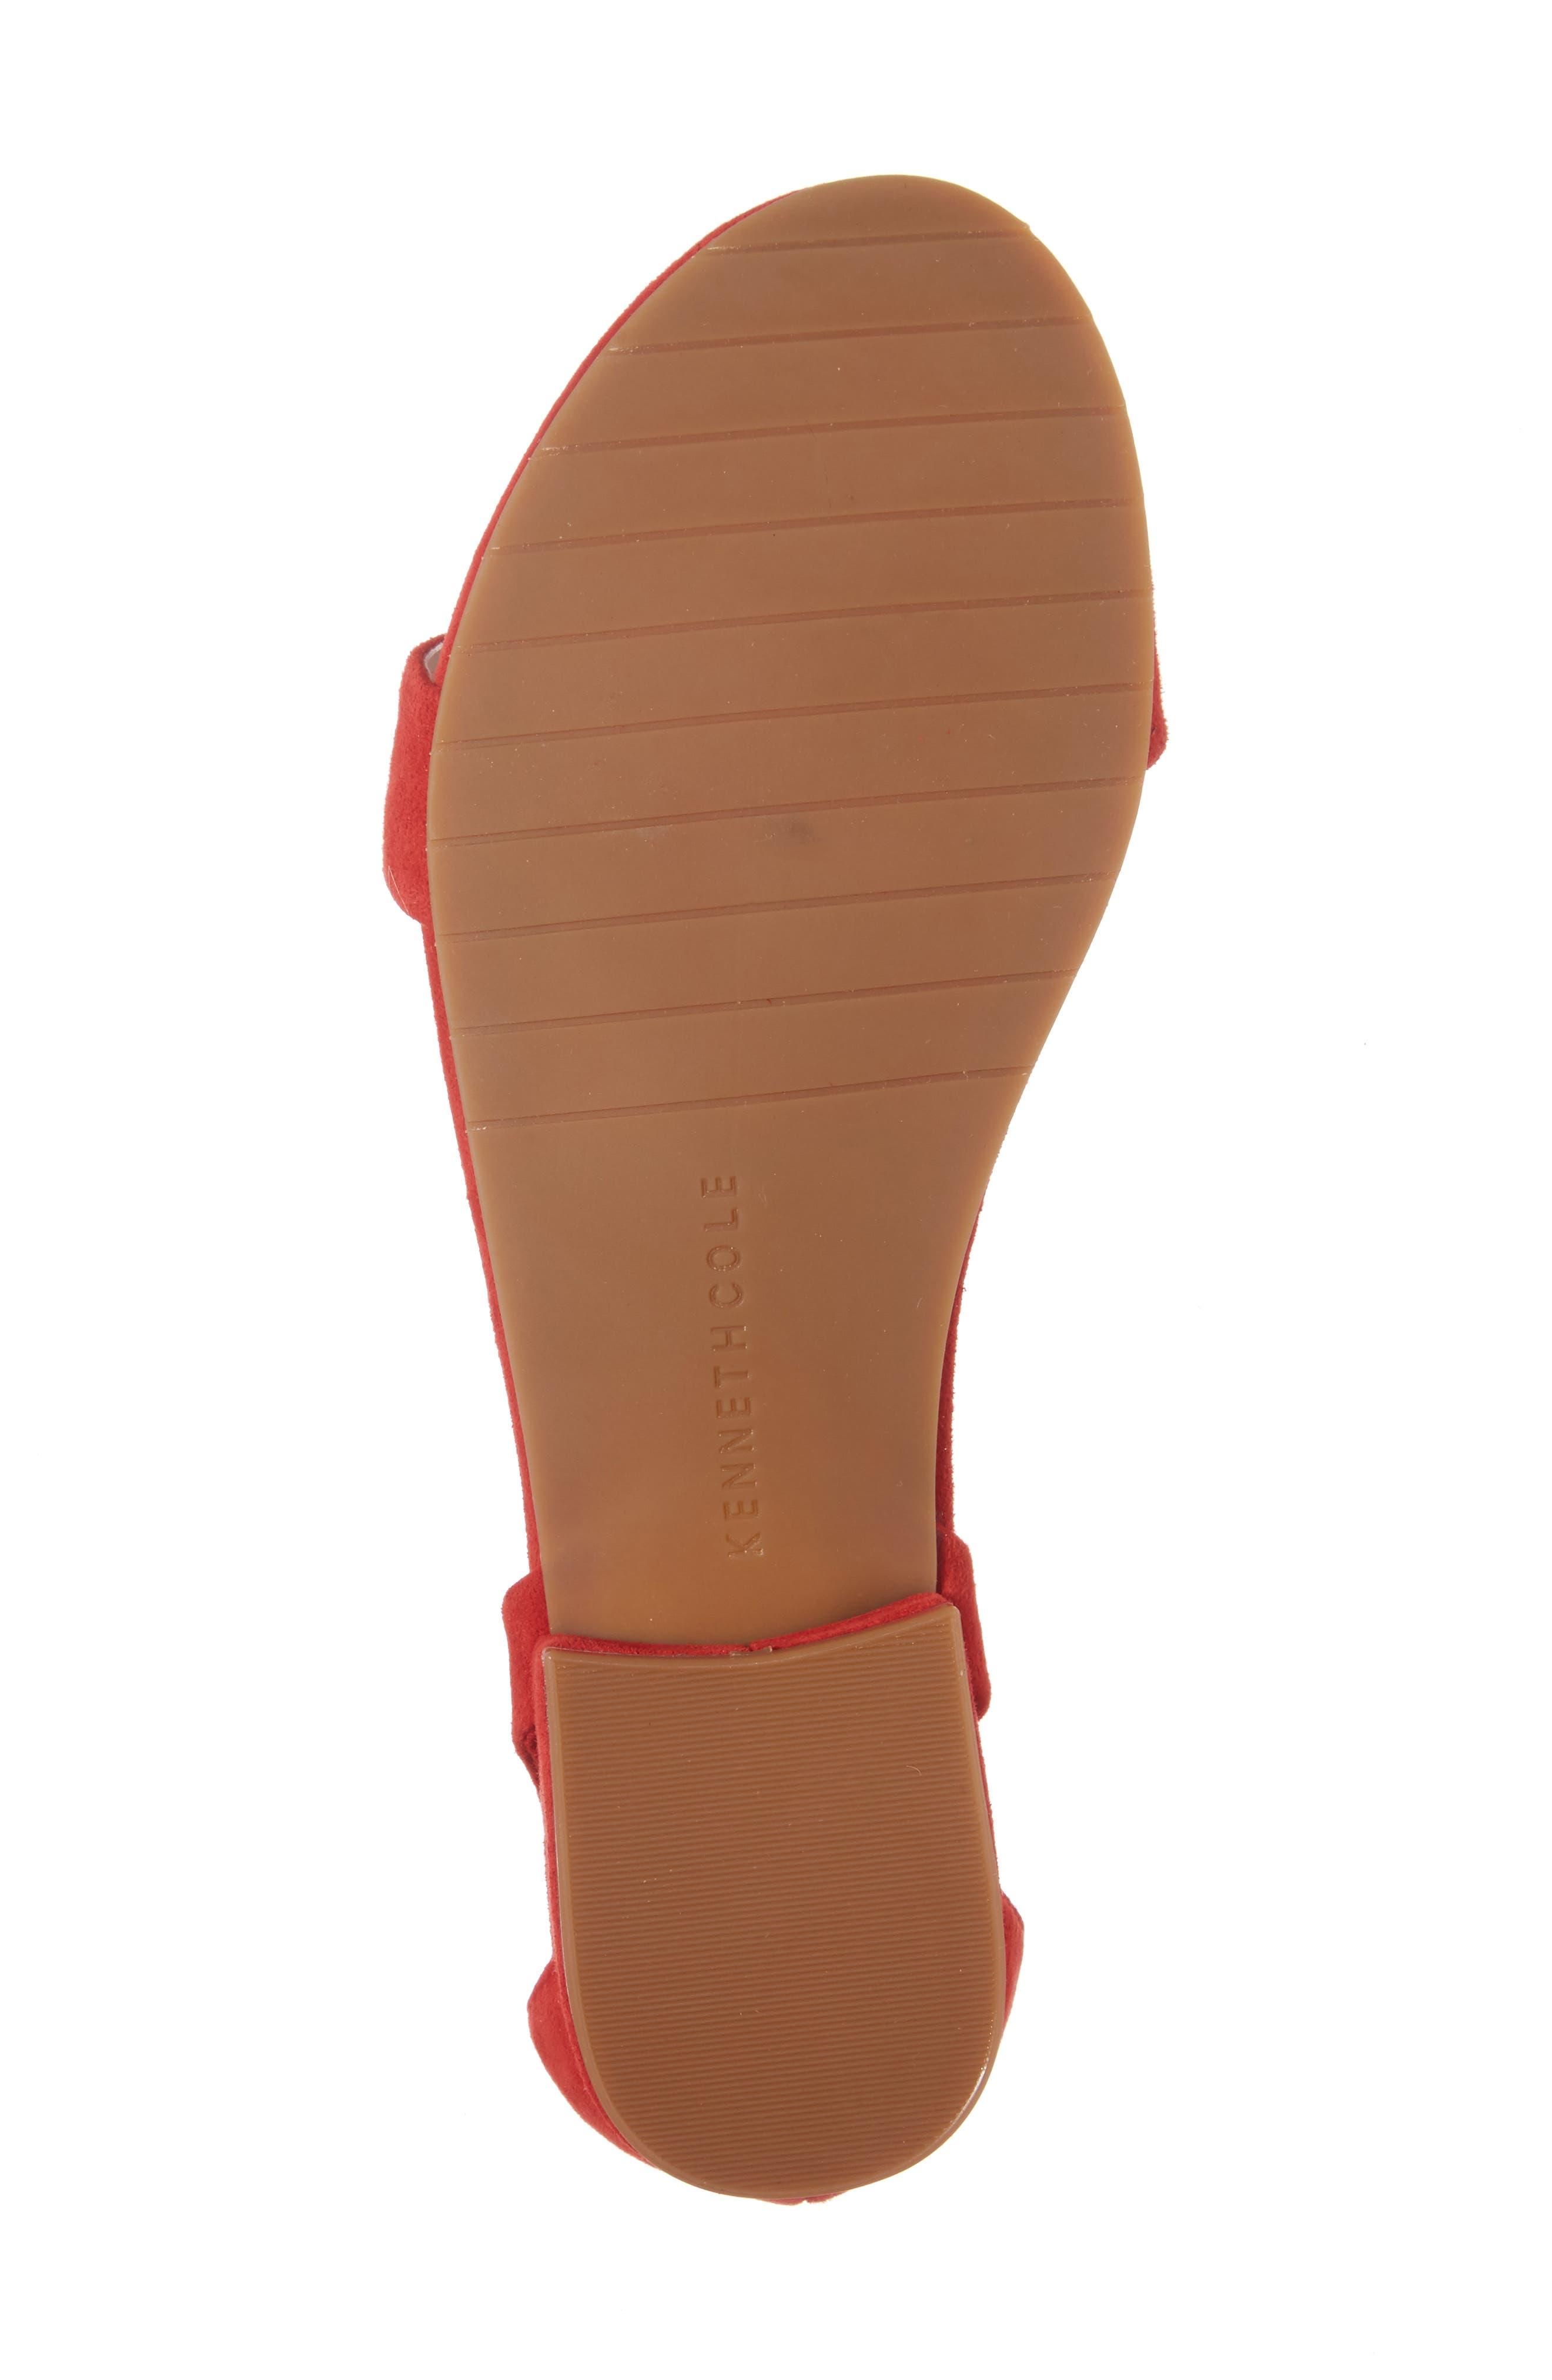 Valen Tassel Lace-Up Sandal,                             Alternate thumbnail 76, color,